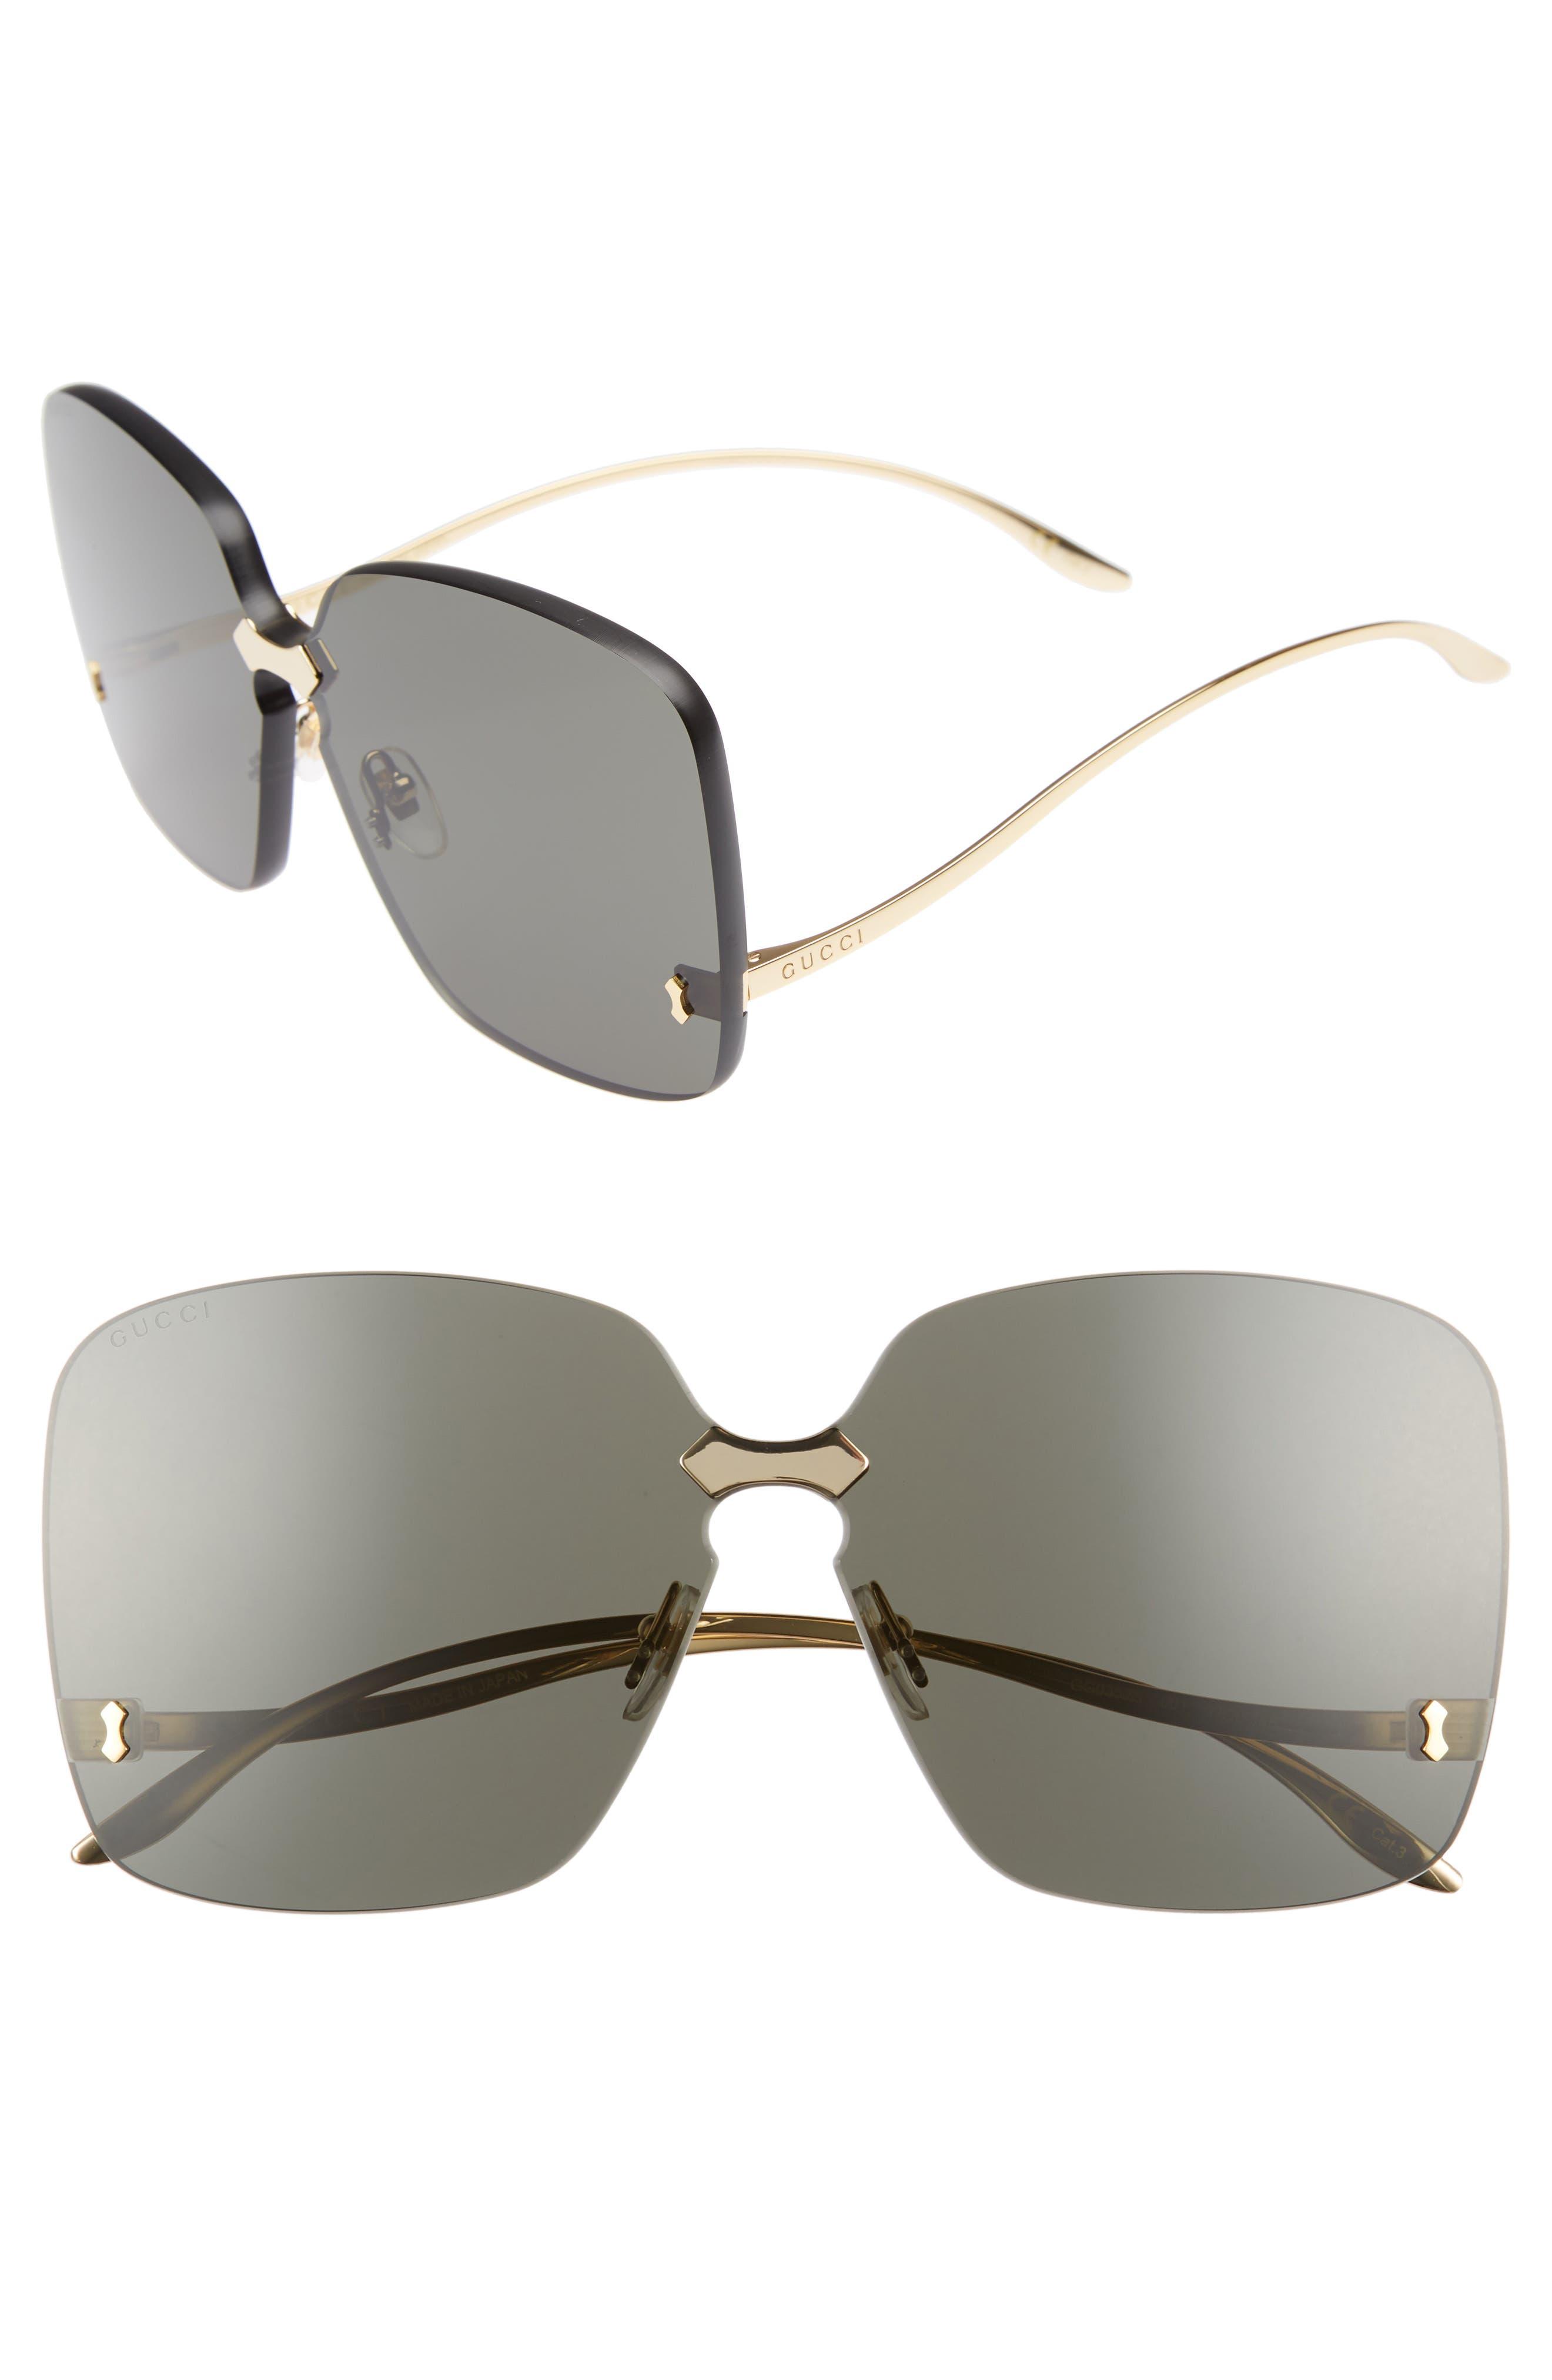 GUCCI, 99mm Rimless Sunglasses, Main thumbnail 1, color, 710